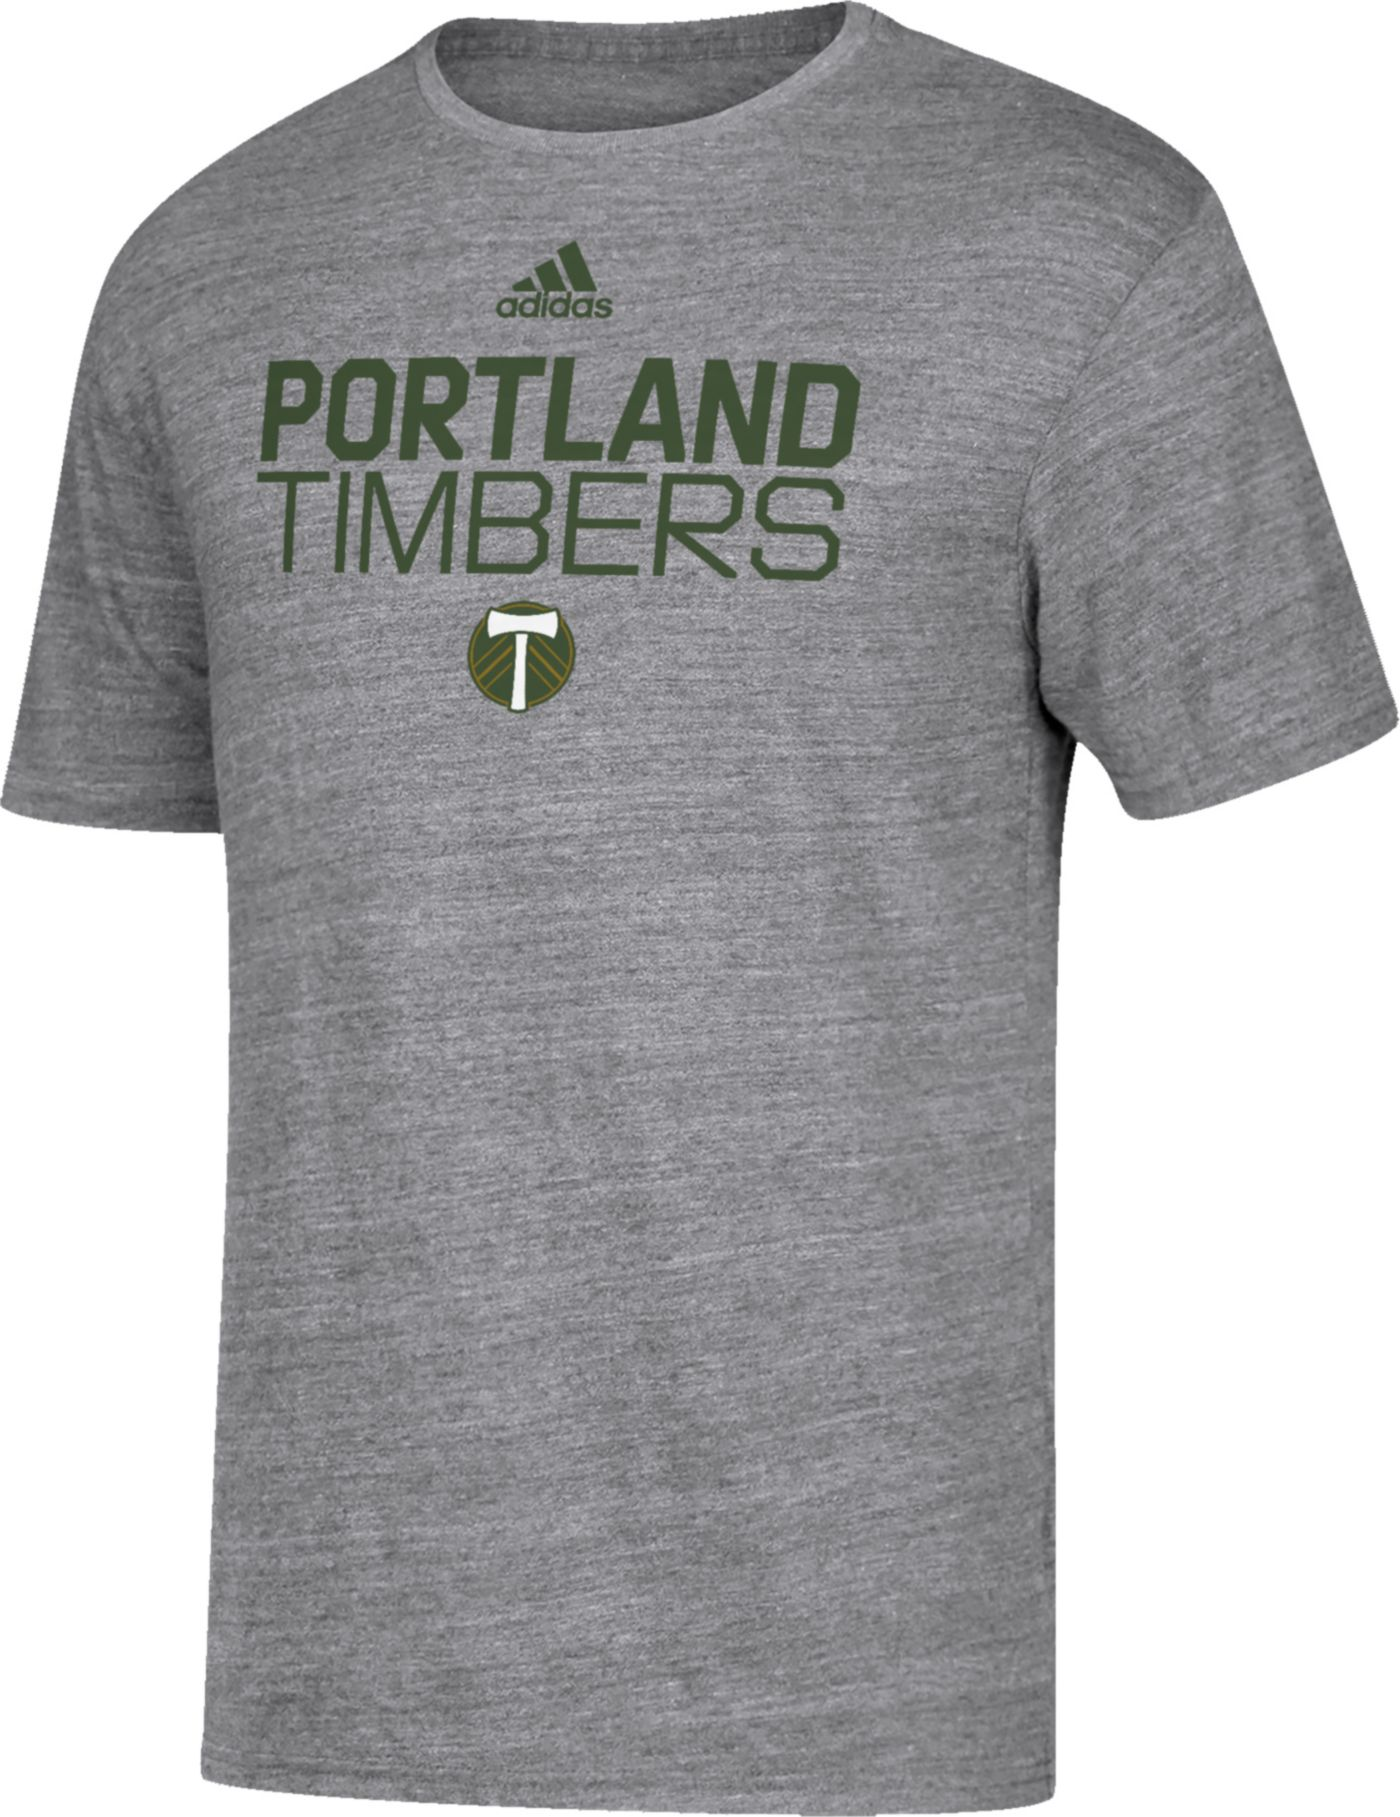 adidas Men's Portland Timbers Locker Heather Grey Tri-Blend T-Shirt